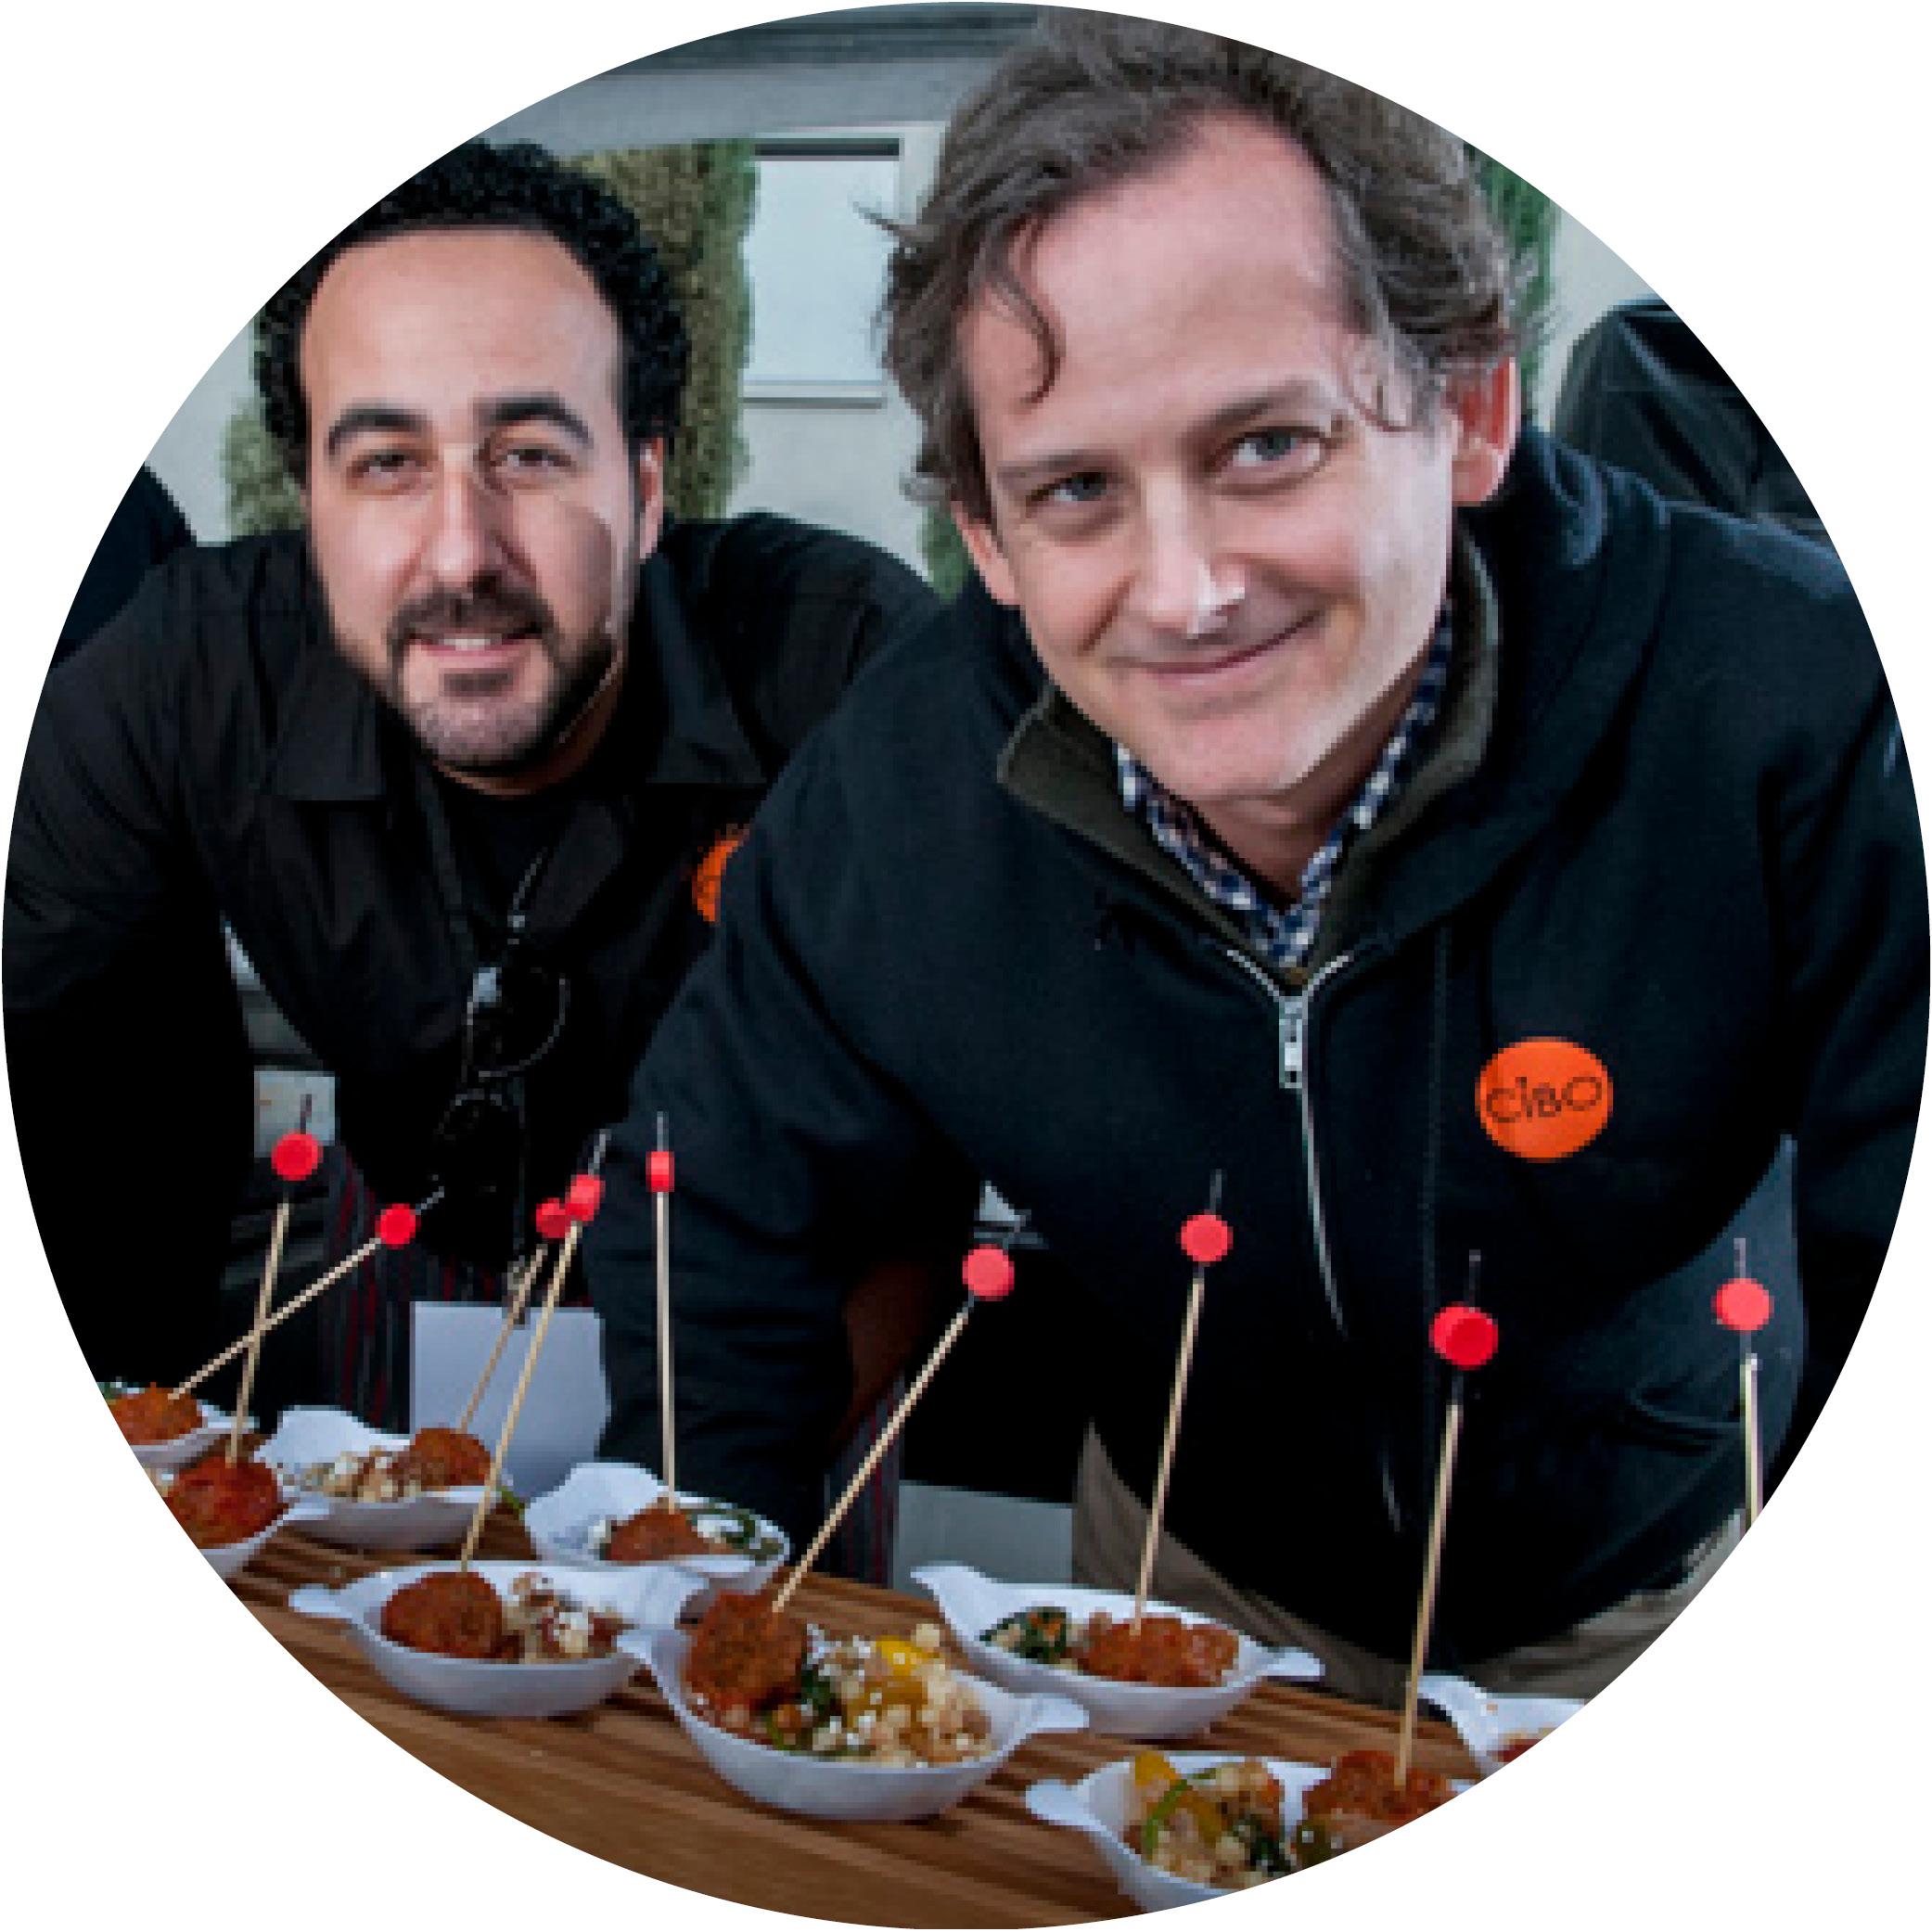 DevourPhoenix-2019-ChefHeadshots-Cibo.jpg